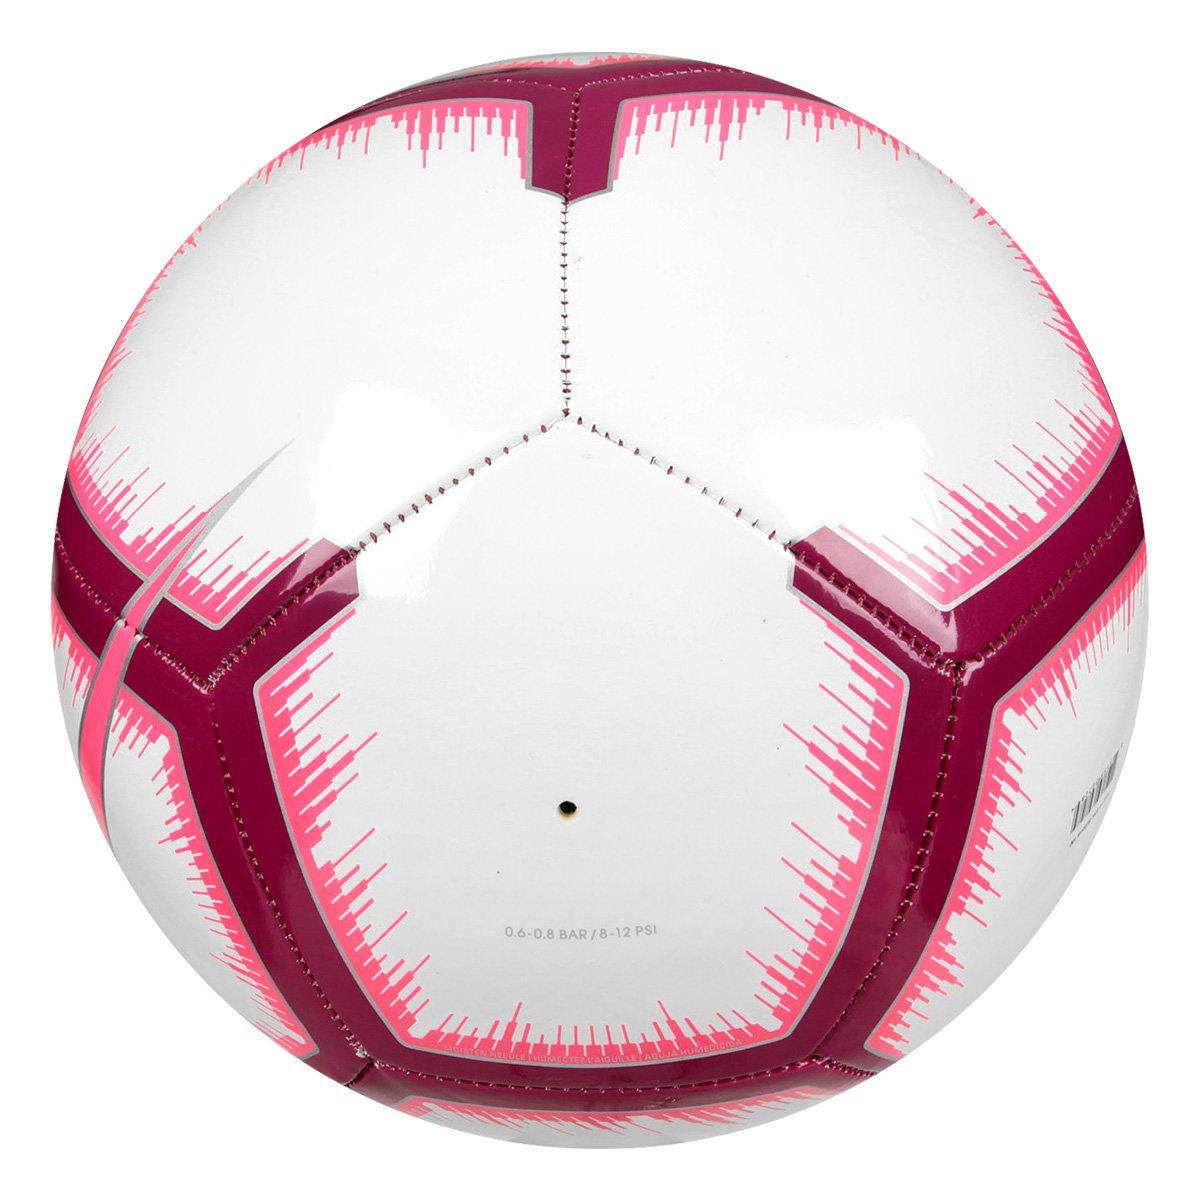 Bola de Futebol Campo Nike La Liga Pitch - Branco e Vermelho ... 67aaad3199faf